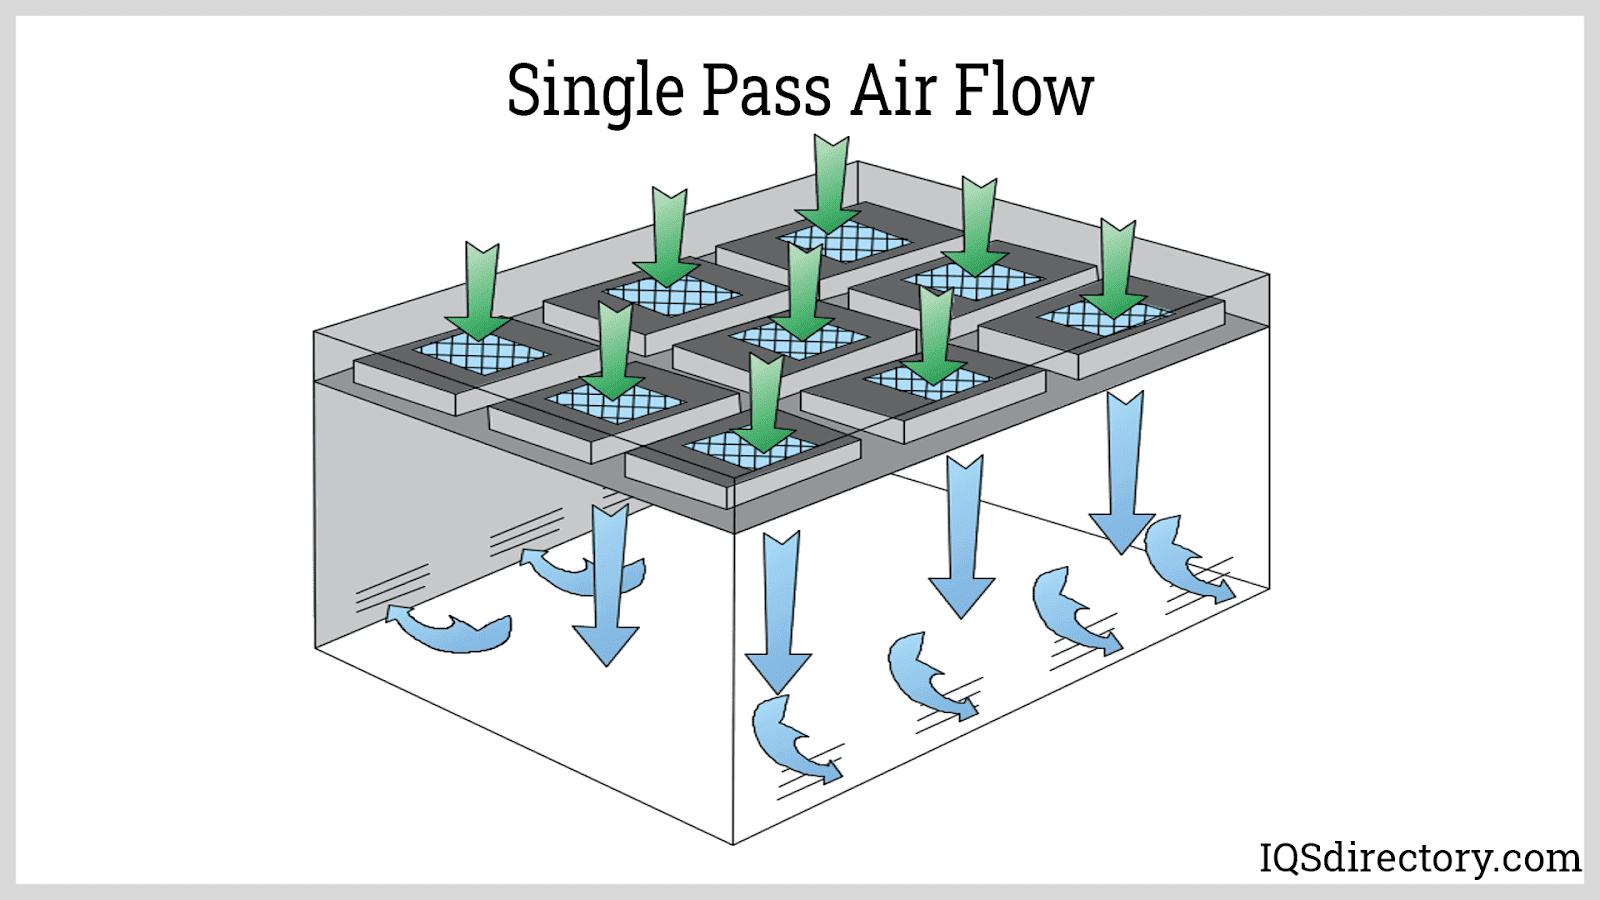 Single Pass Air Flow